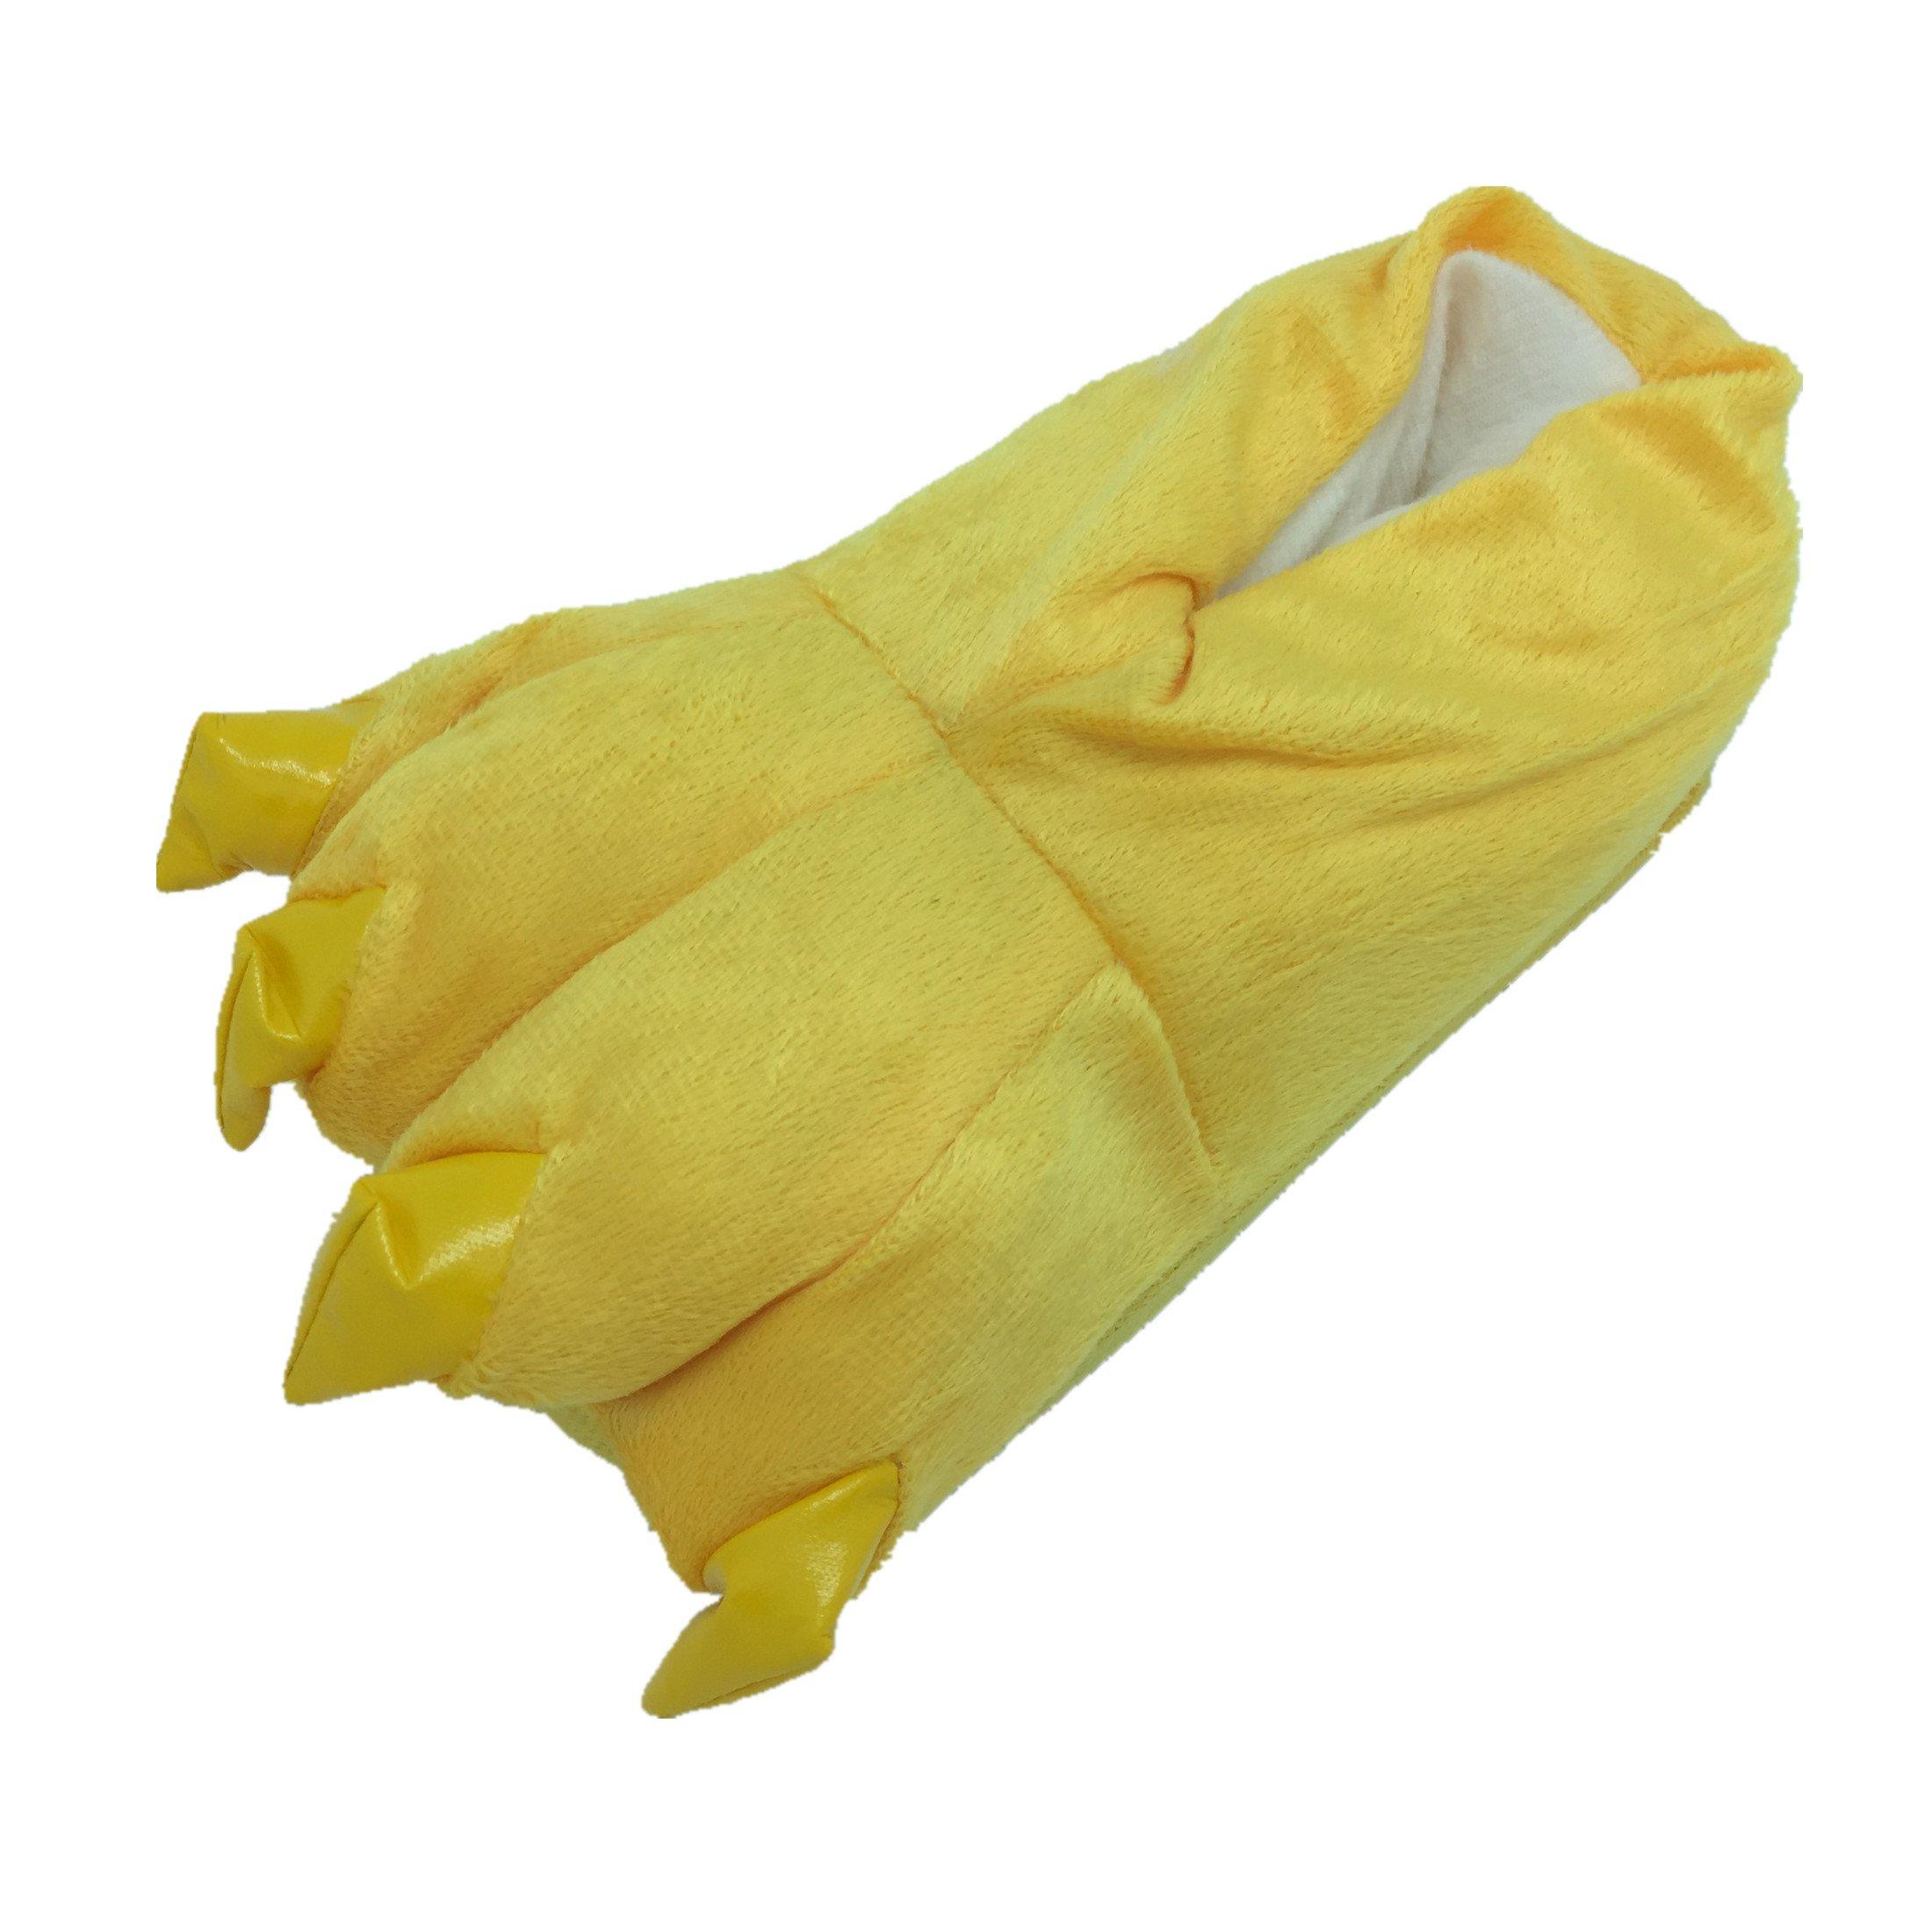 Plush Warm House Shoes Animal Feet Slippers Costume Yellow M